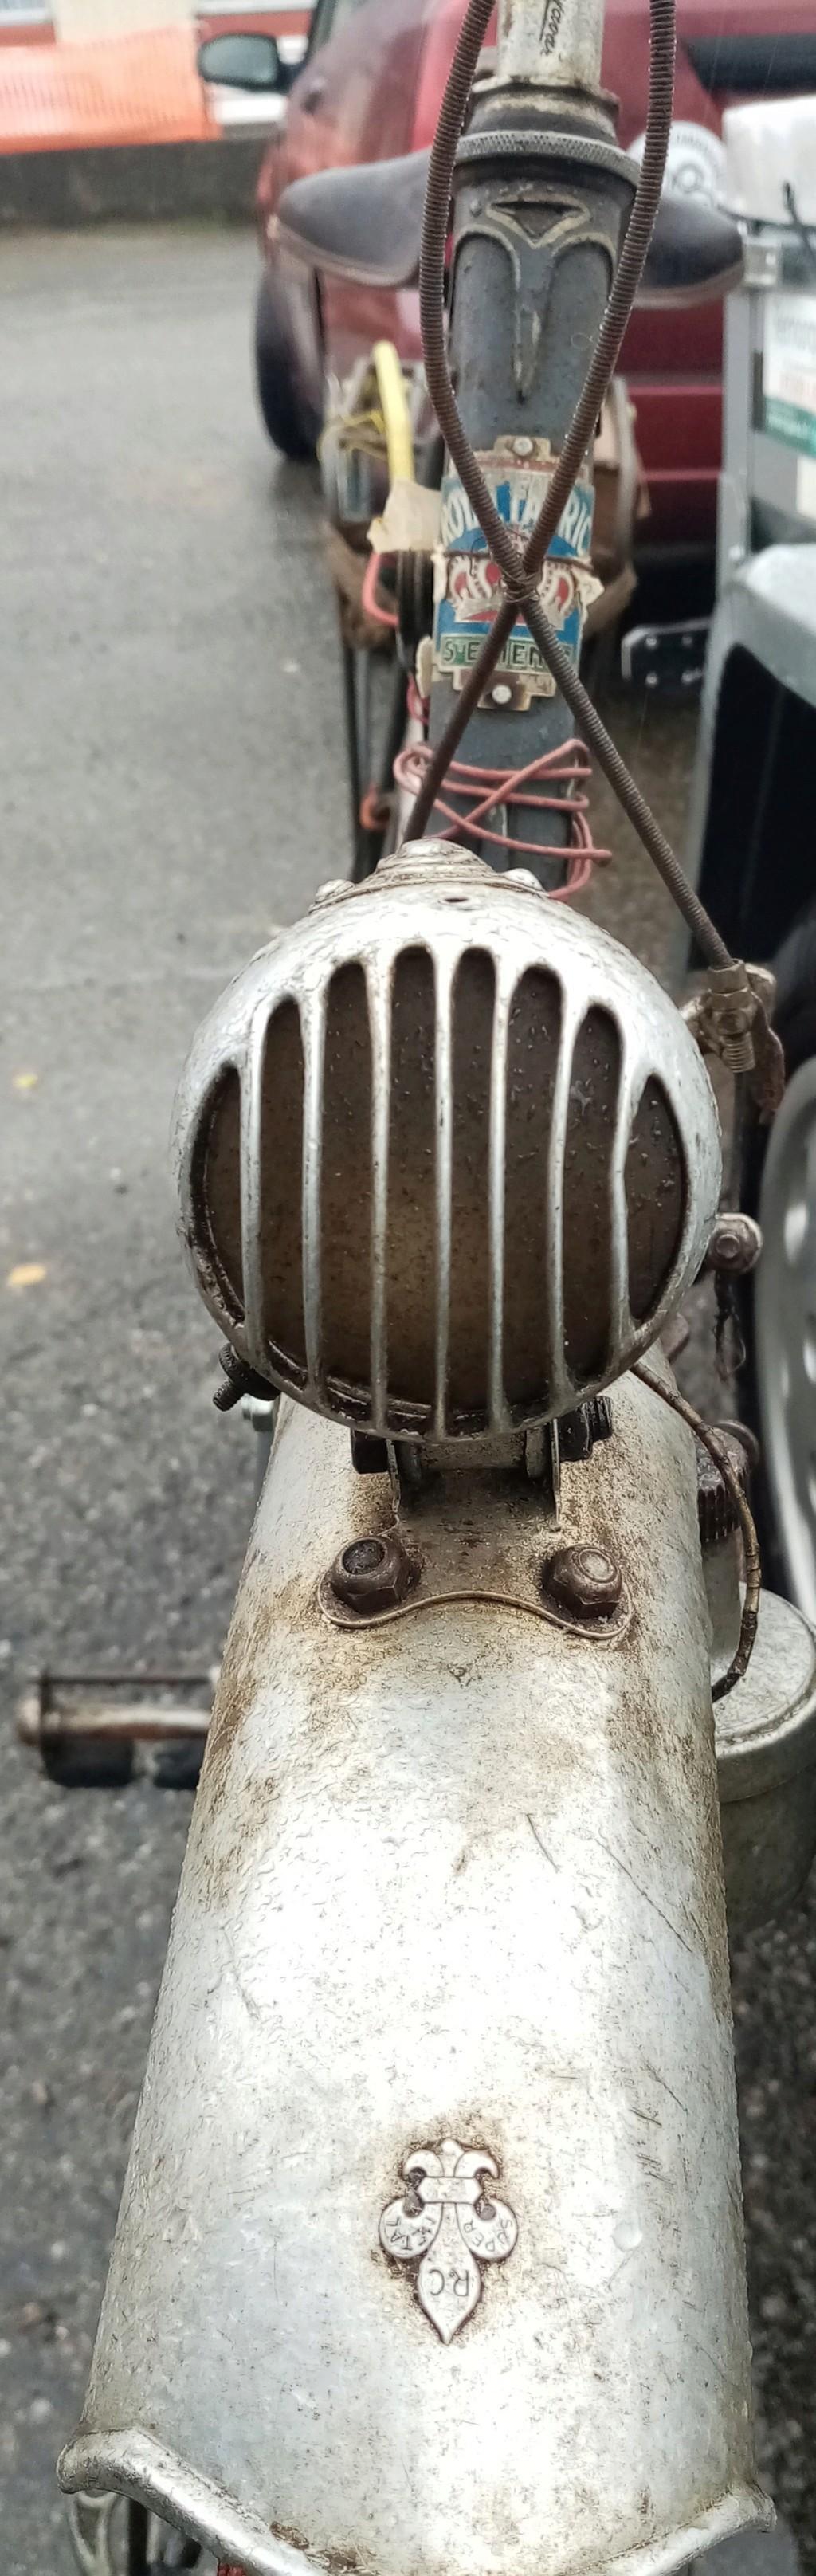 vélo mixte 1937-39 ROYAL FABRIC  3v CYCLO  200710